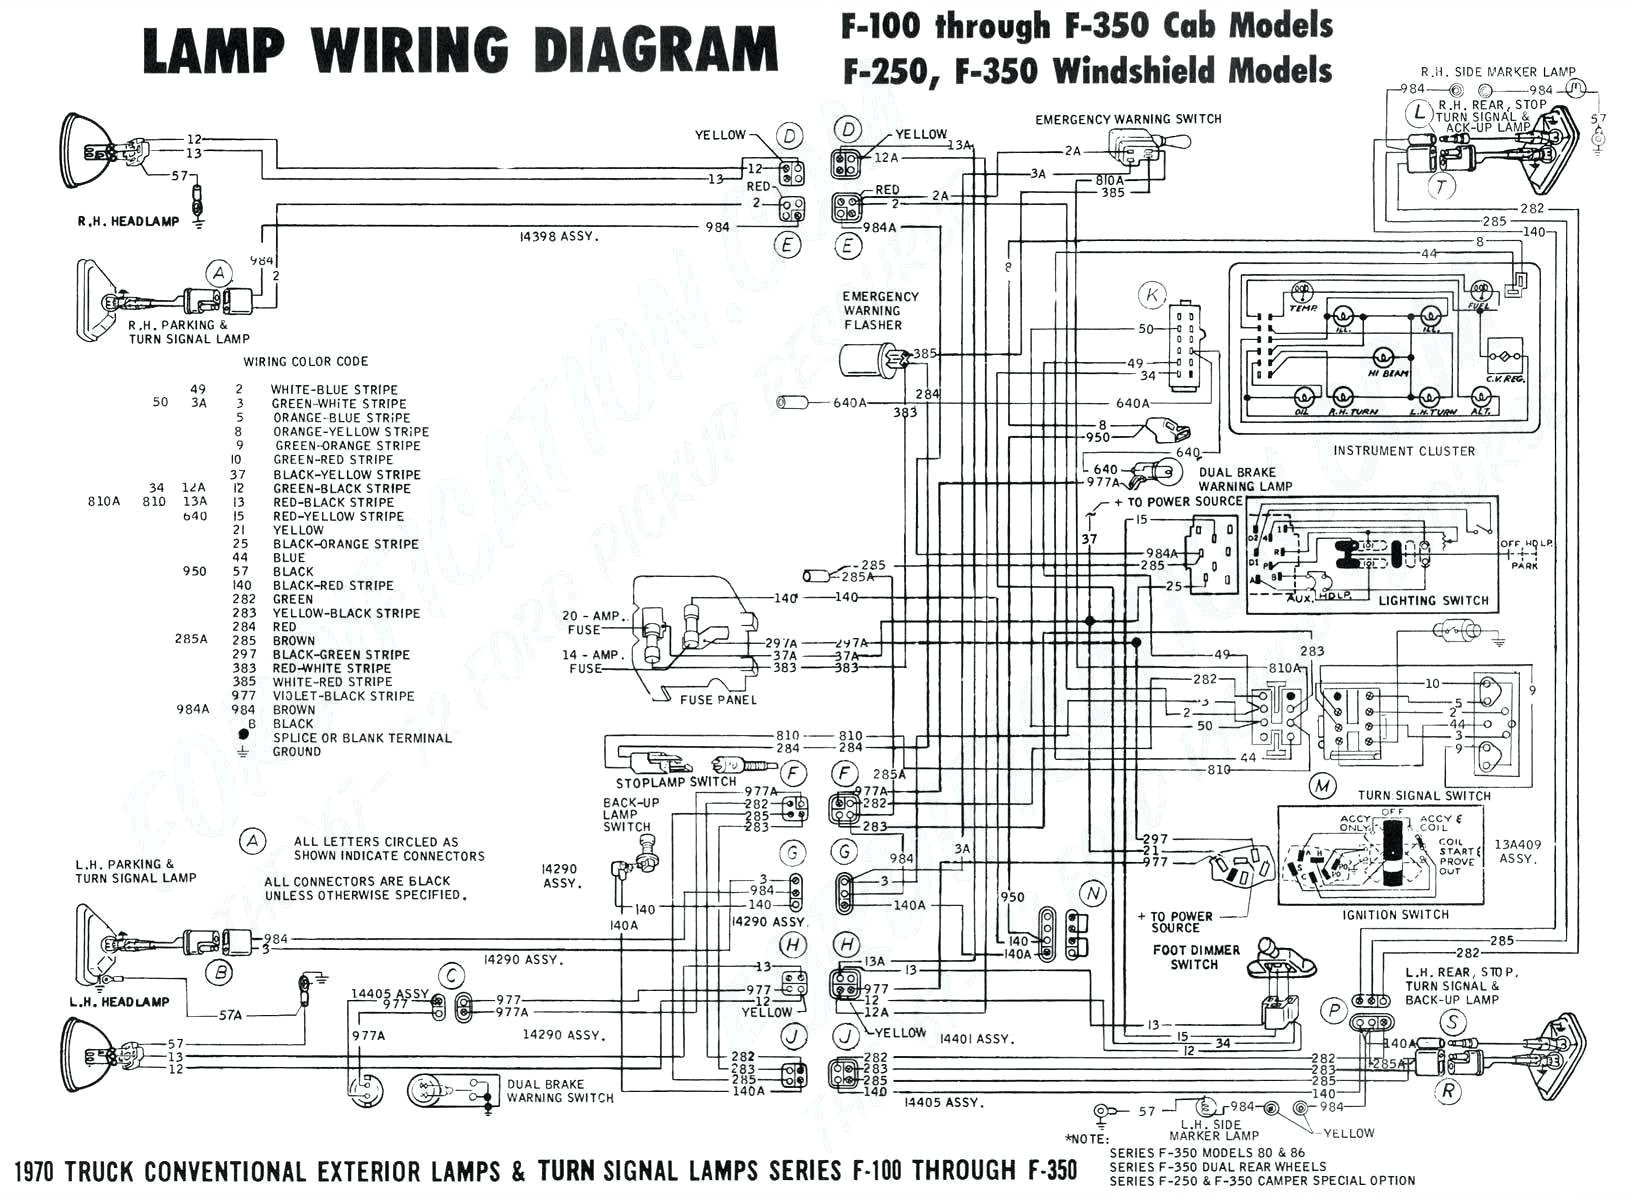 1994 Dodge Dakota Wiring Diagram Dodge Durango Radio Removal On 2000 Dodge Durango Ignition Wiring